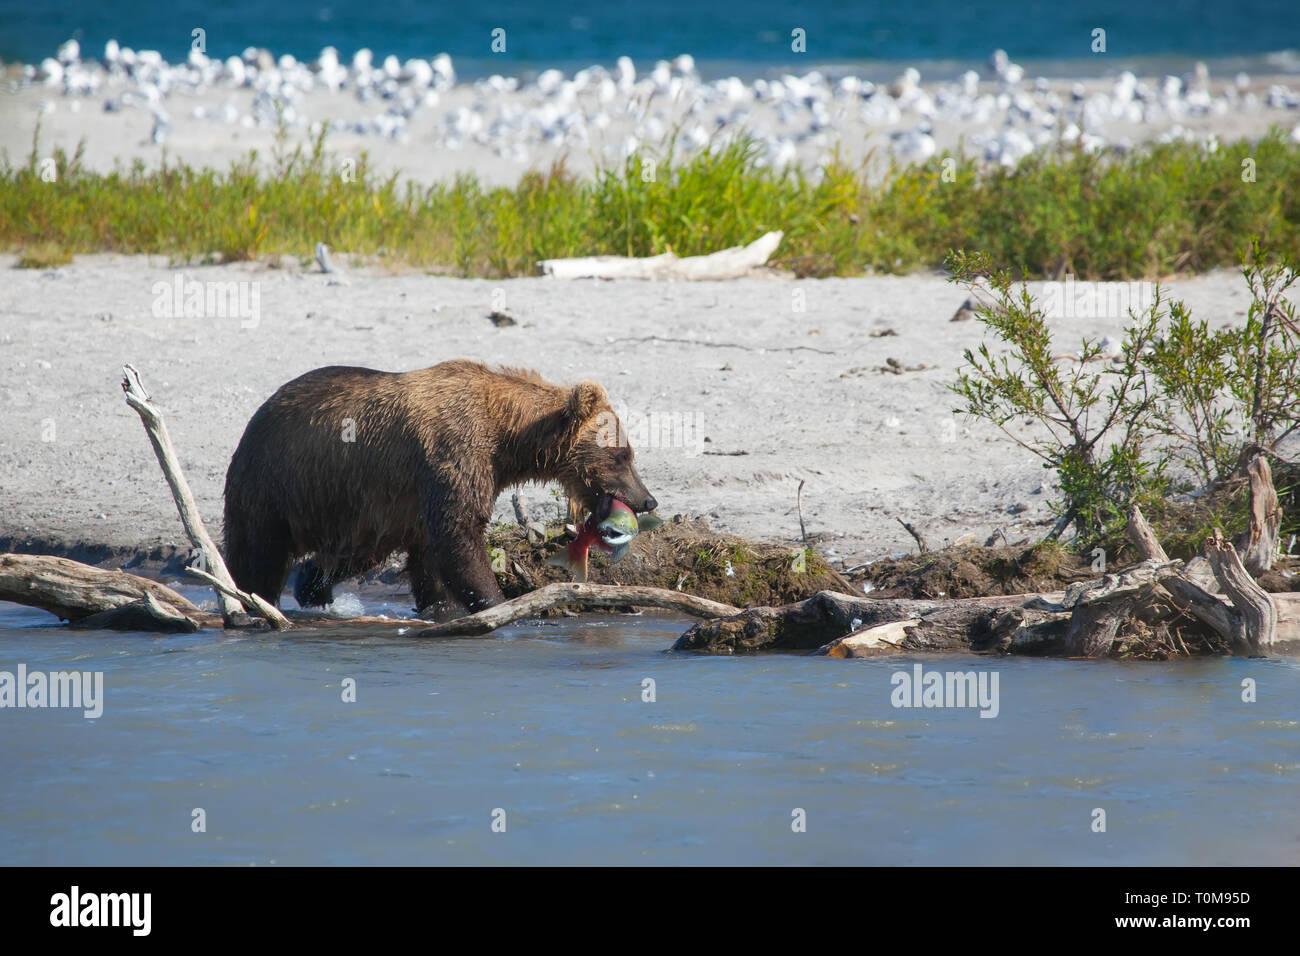 A brown wild  bear fishing in Kuril lake. Kkronotsky nature reserve. Kamchatka. Russia. - Stock Image